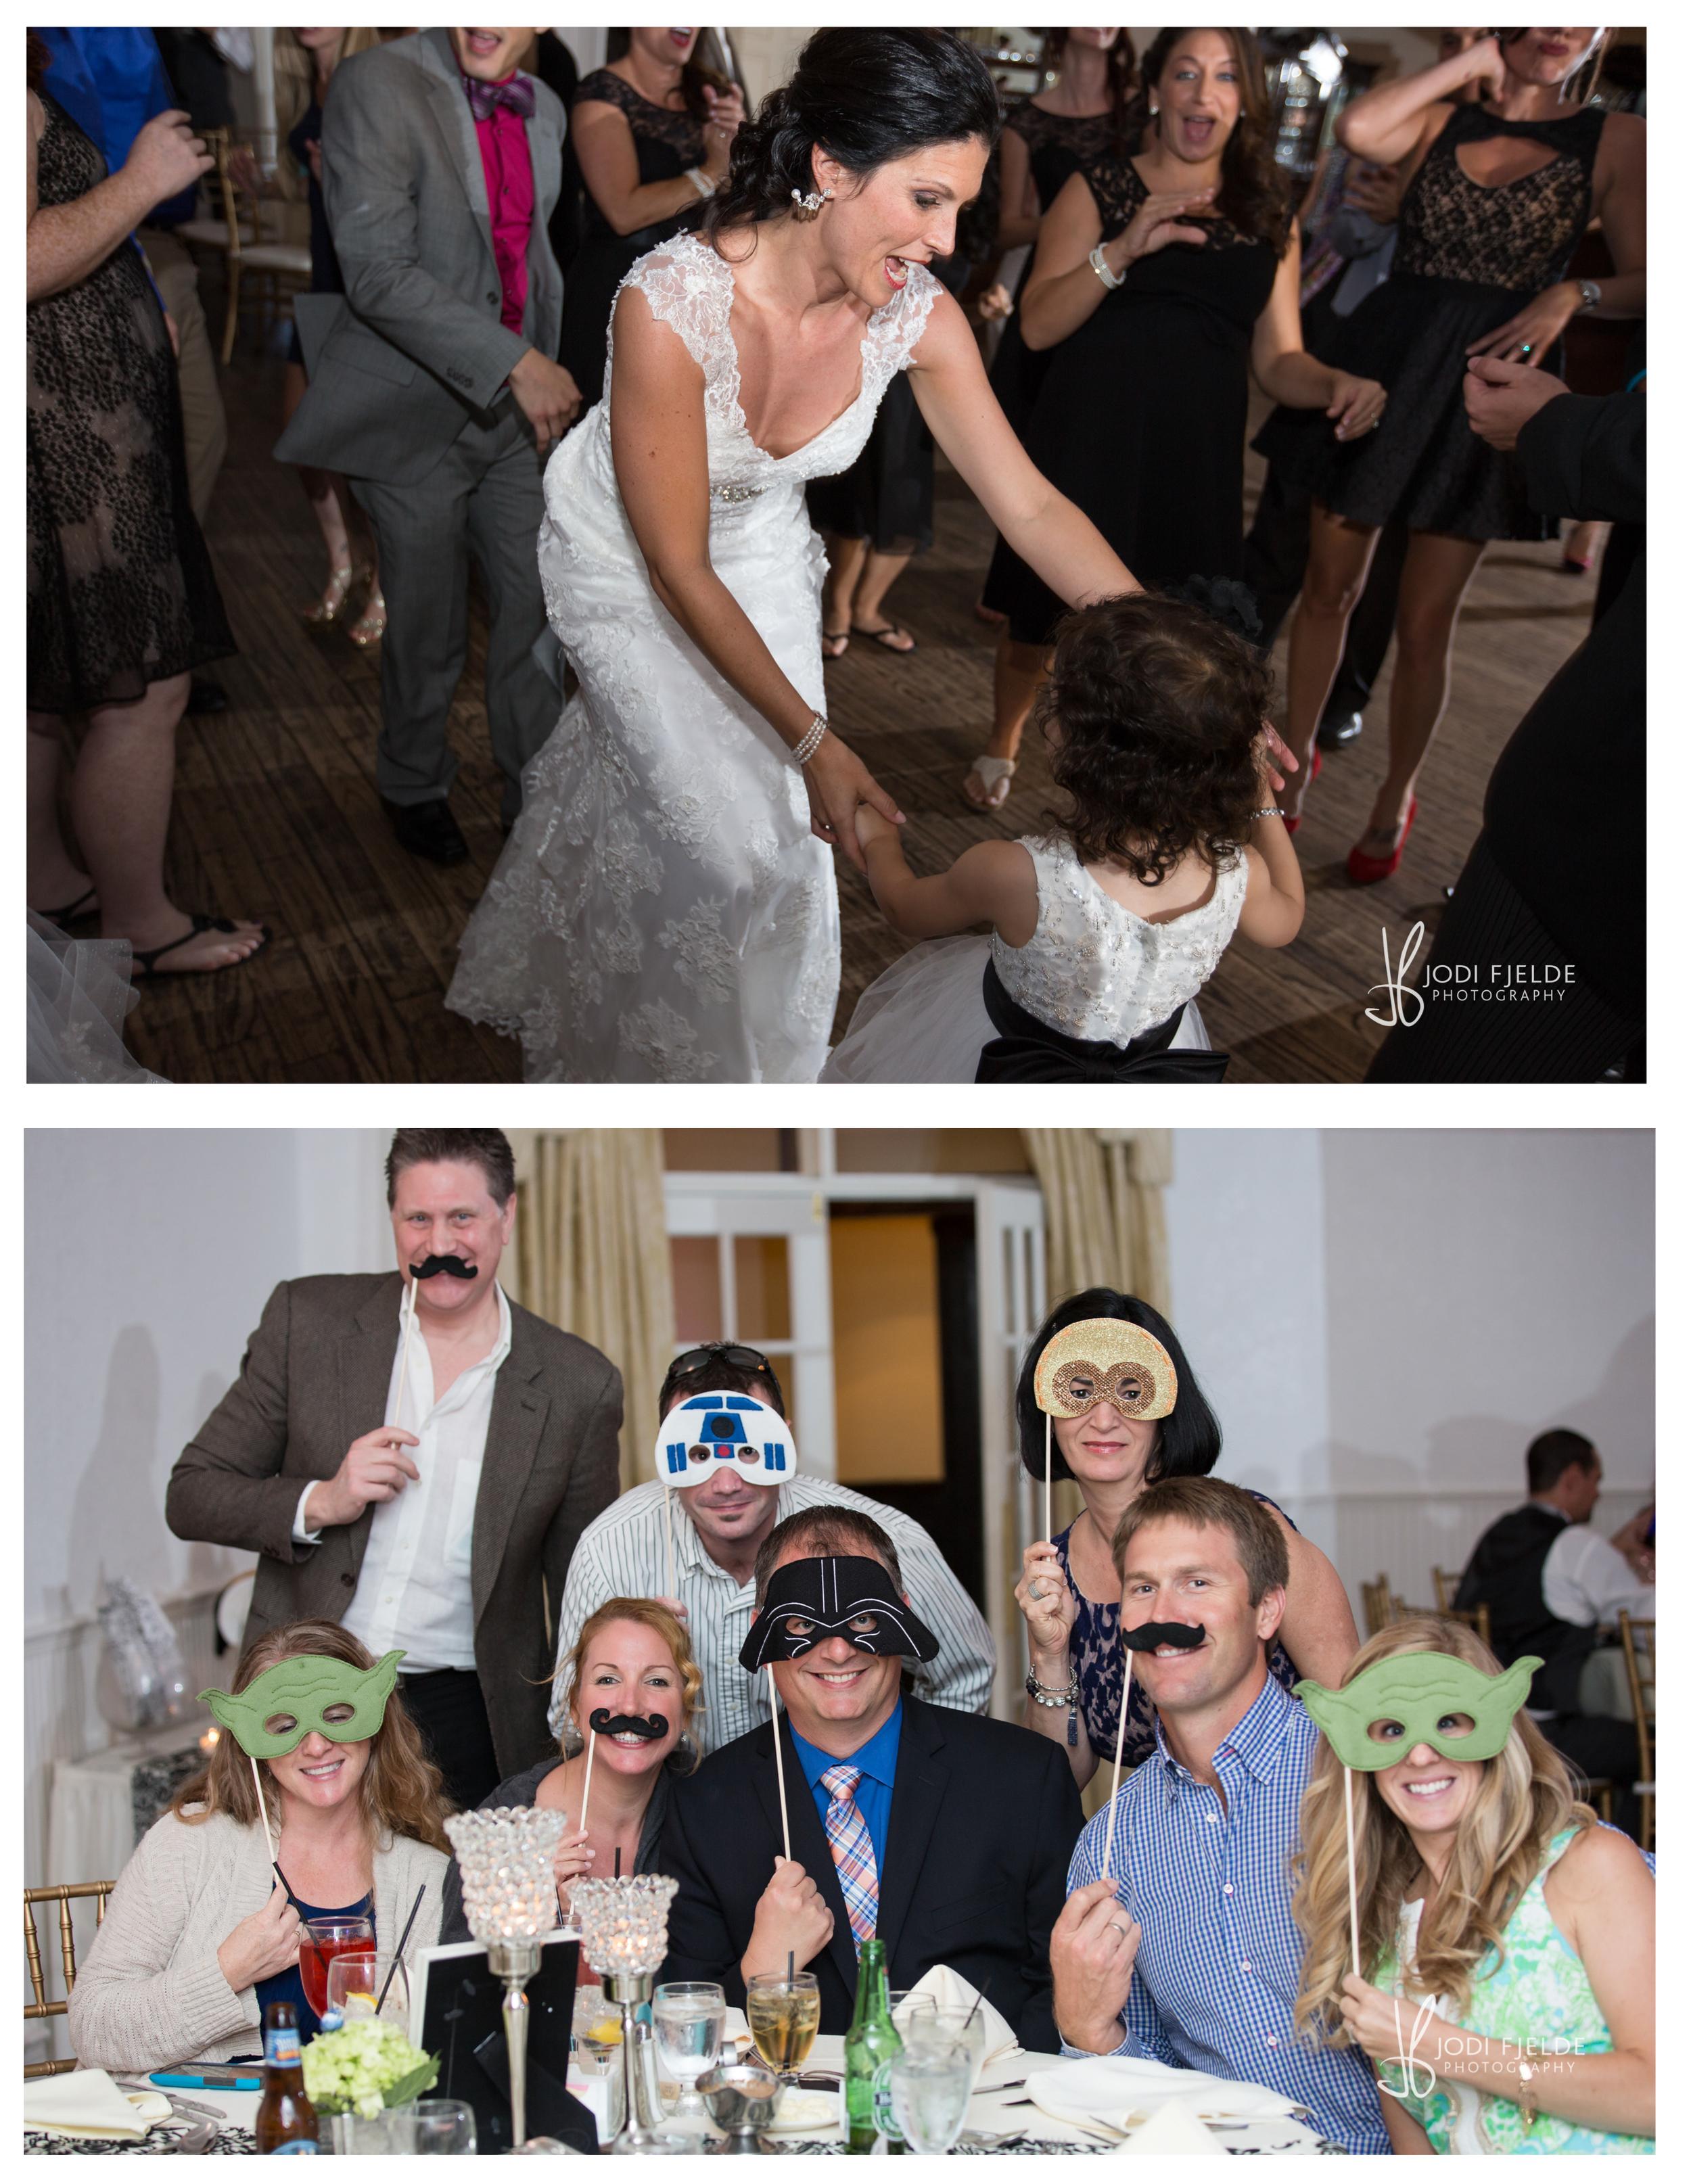 Highland_Manor_Apopka_Florida_wedding_Jackie_&_Tim_photography_jodi_Fjelde_photography-33.jpg